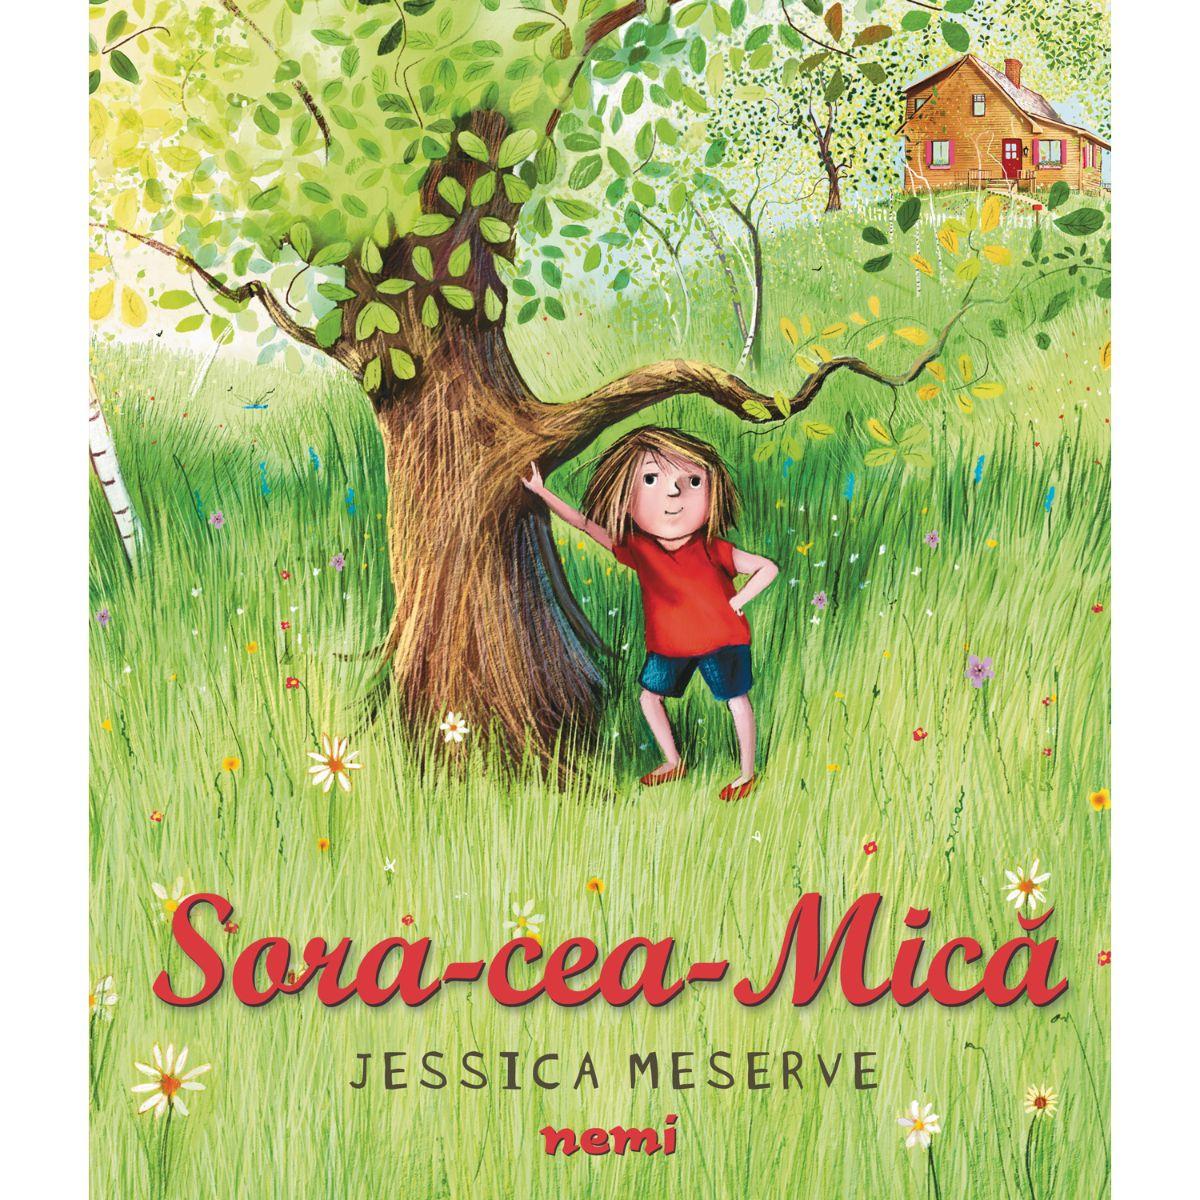 Sora cea mica, Jessica Meserve, Ed 2019